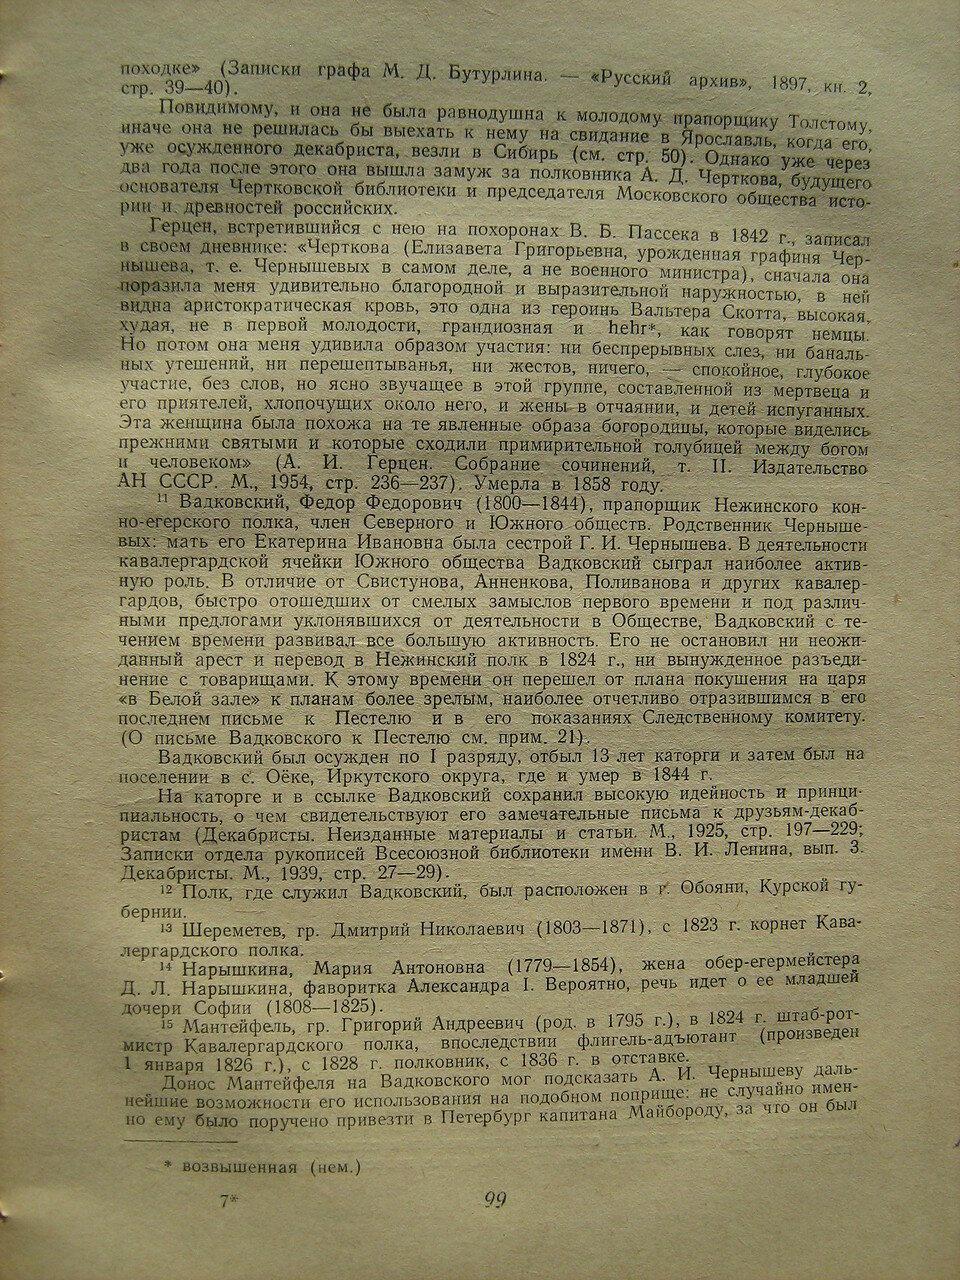 https://img-fotki.yandex.ru/get/516365/199368979.df/0_21f750_a2c3b585_XXXL.jpg